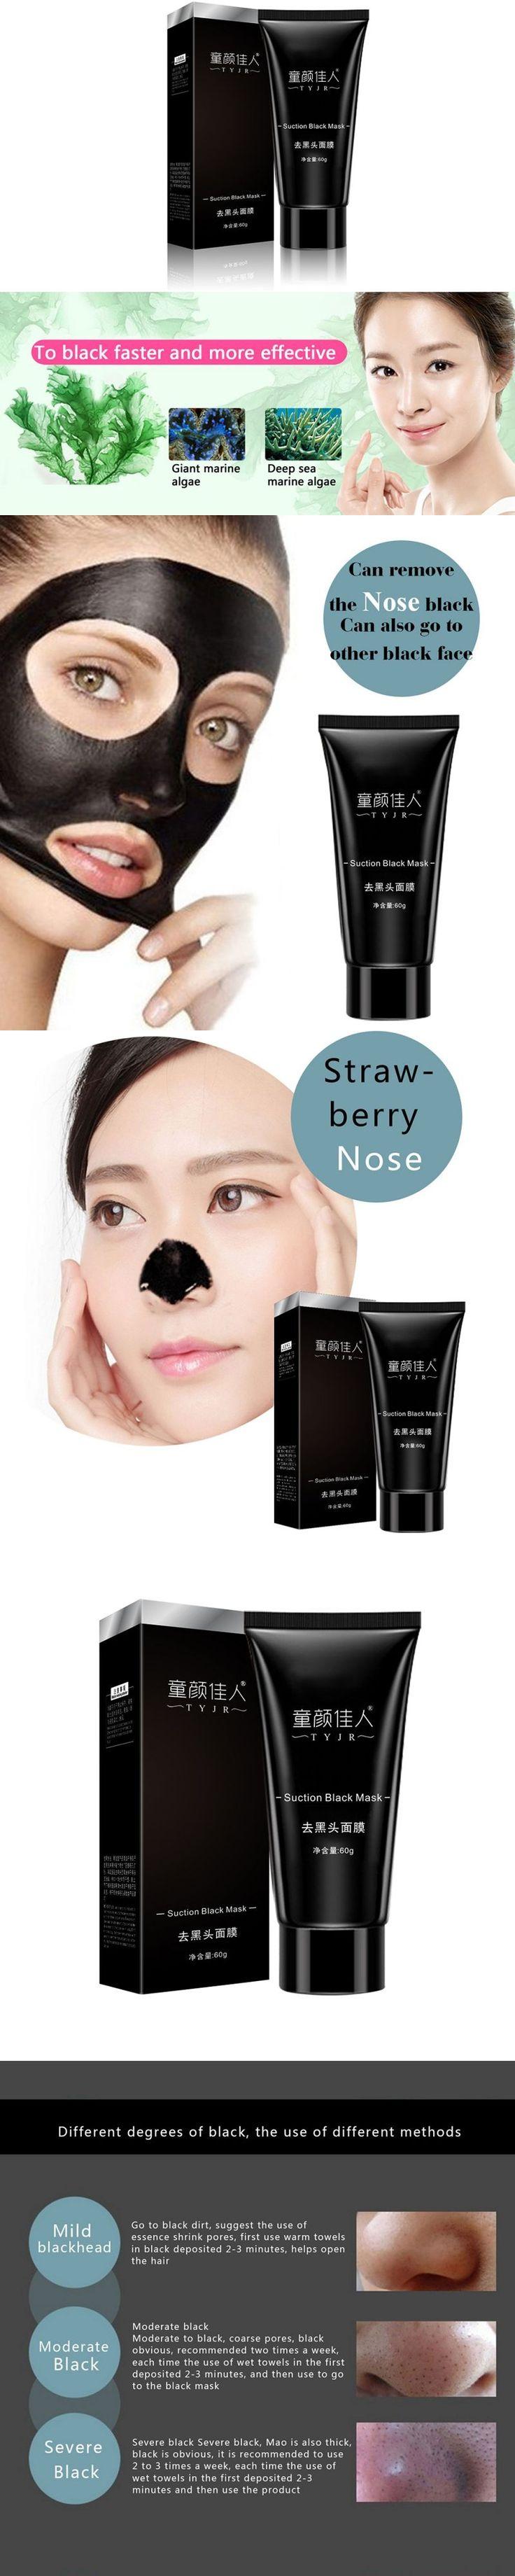 Face Care Suction Black Mask Facial Mask Nose Blackhead Remover Peeling Peel Off Black Head Acne Treatments 78